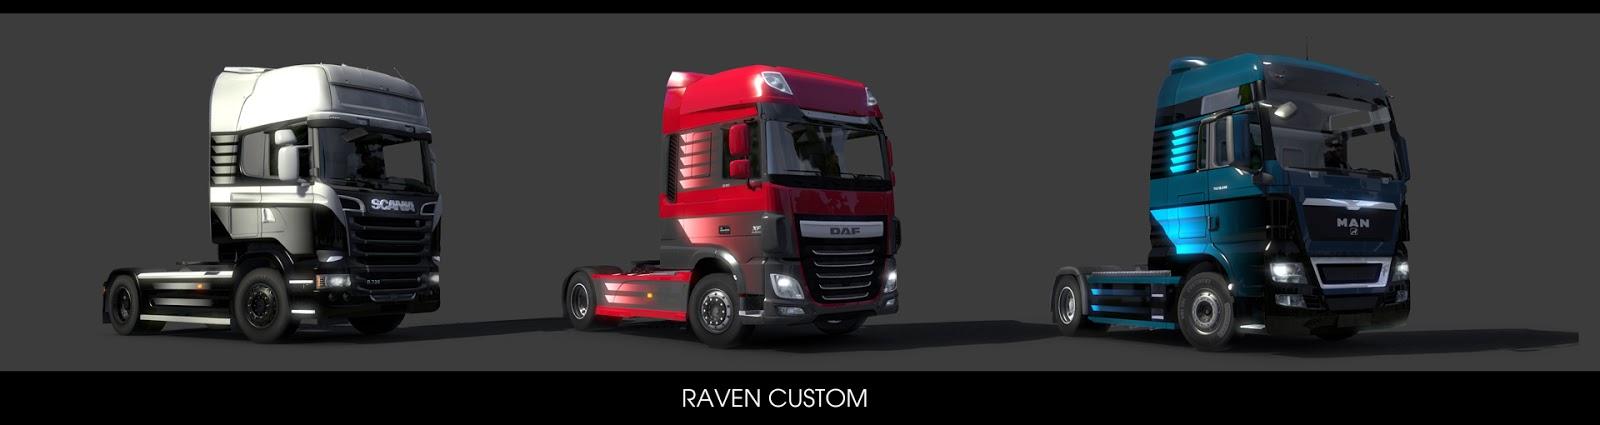 ets2_custom_raven_paintjob_dlc_003.jpg